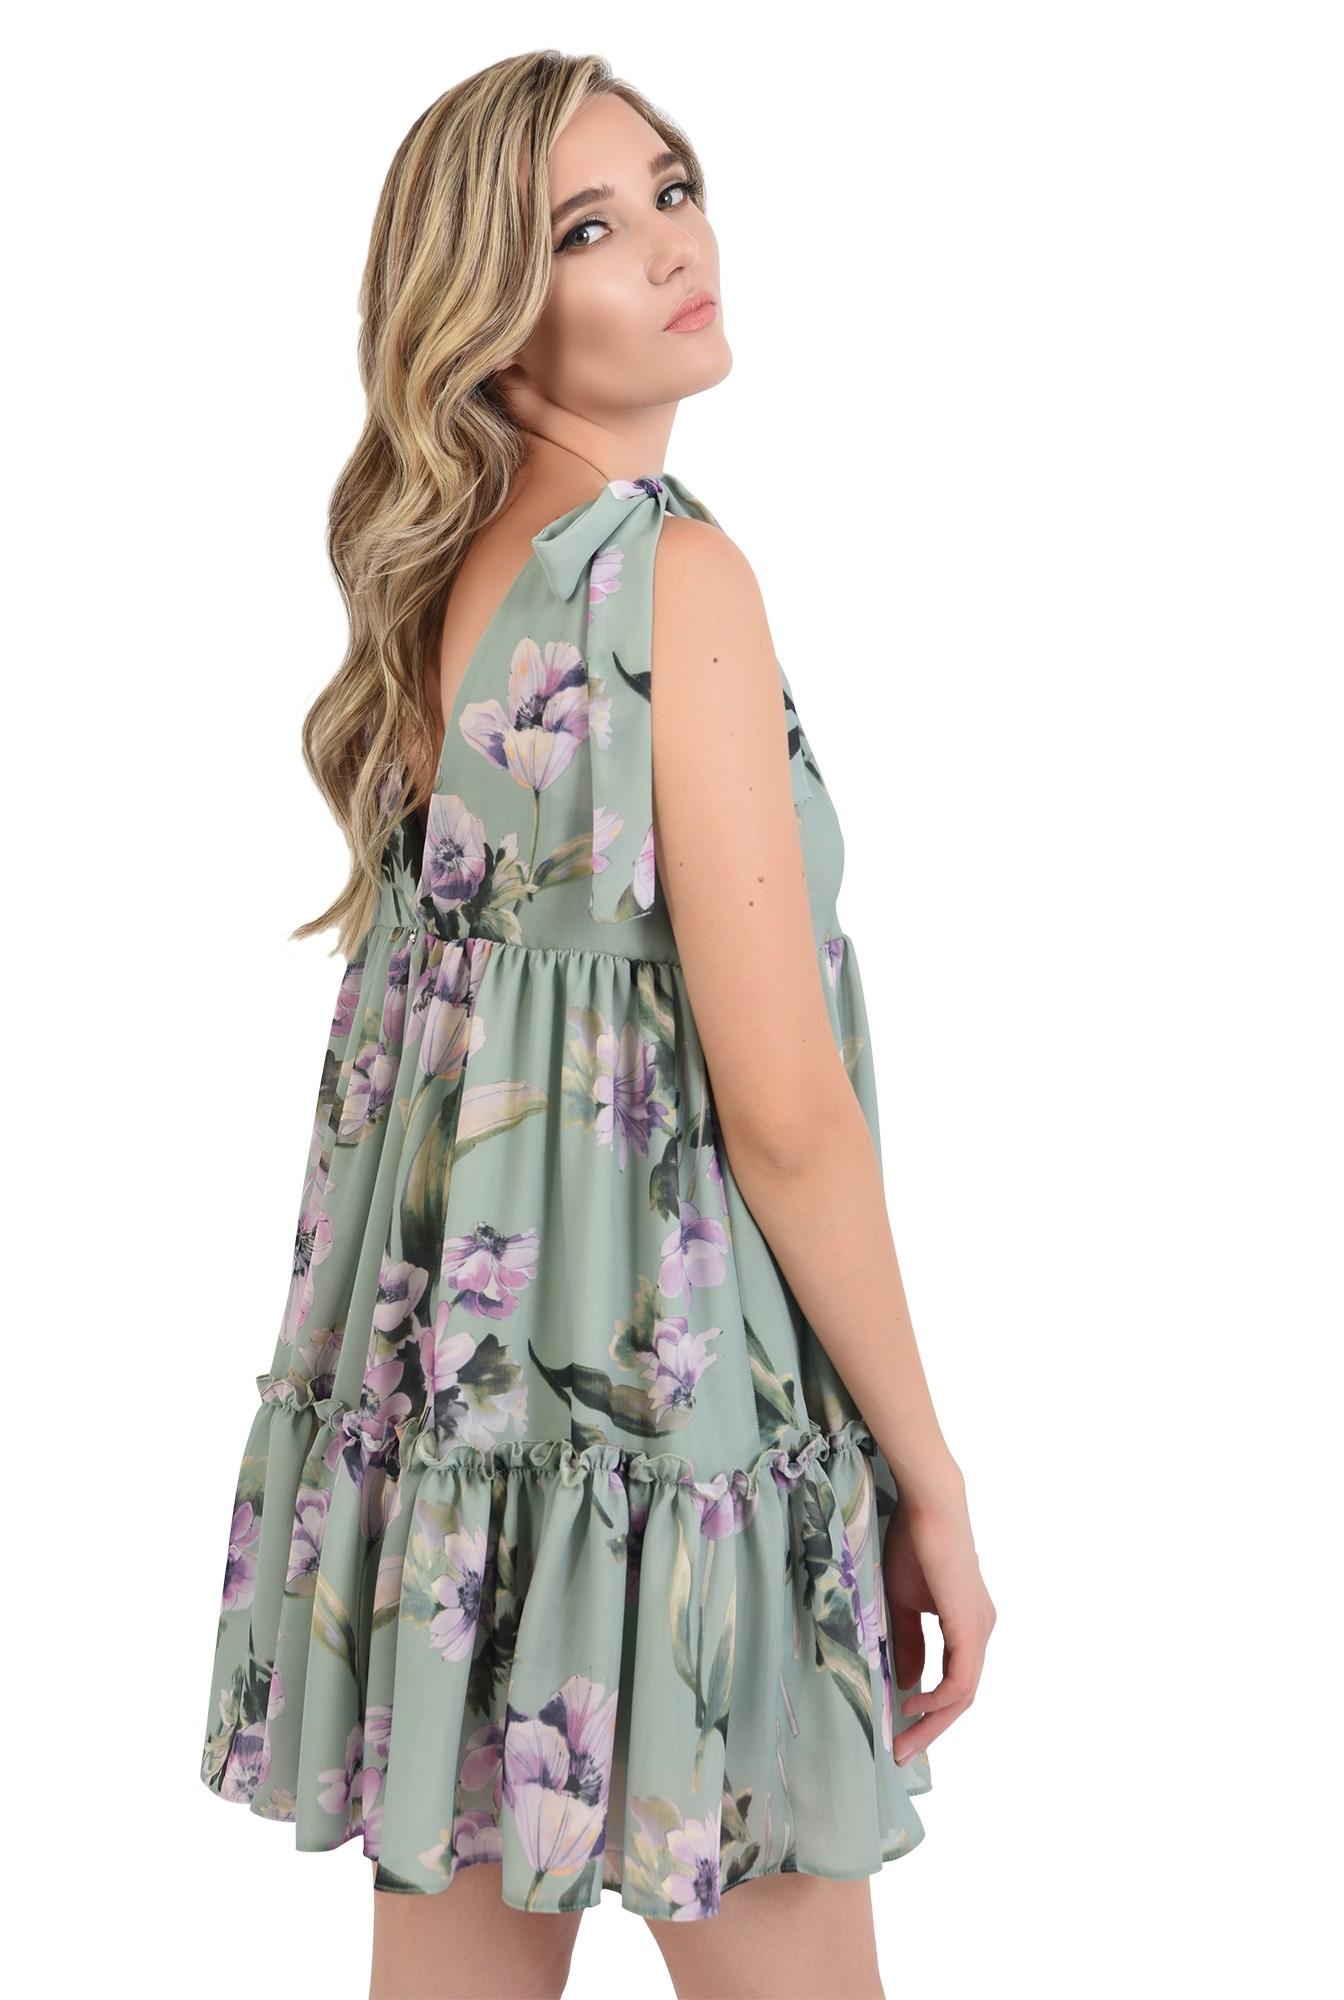 1 - 360 - rochie mini, larga, cu flori, Poema